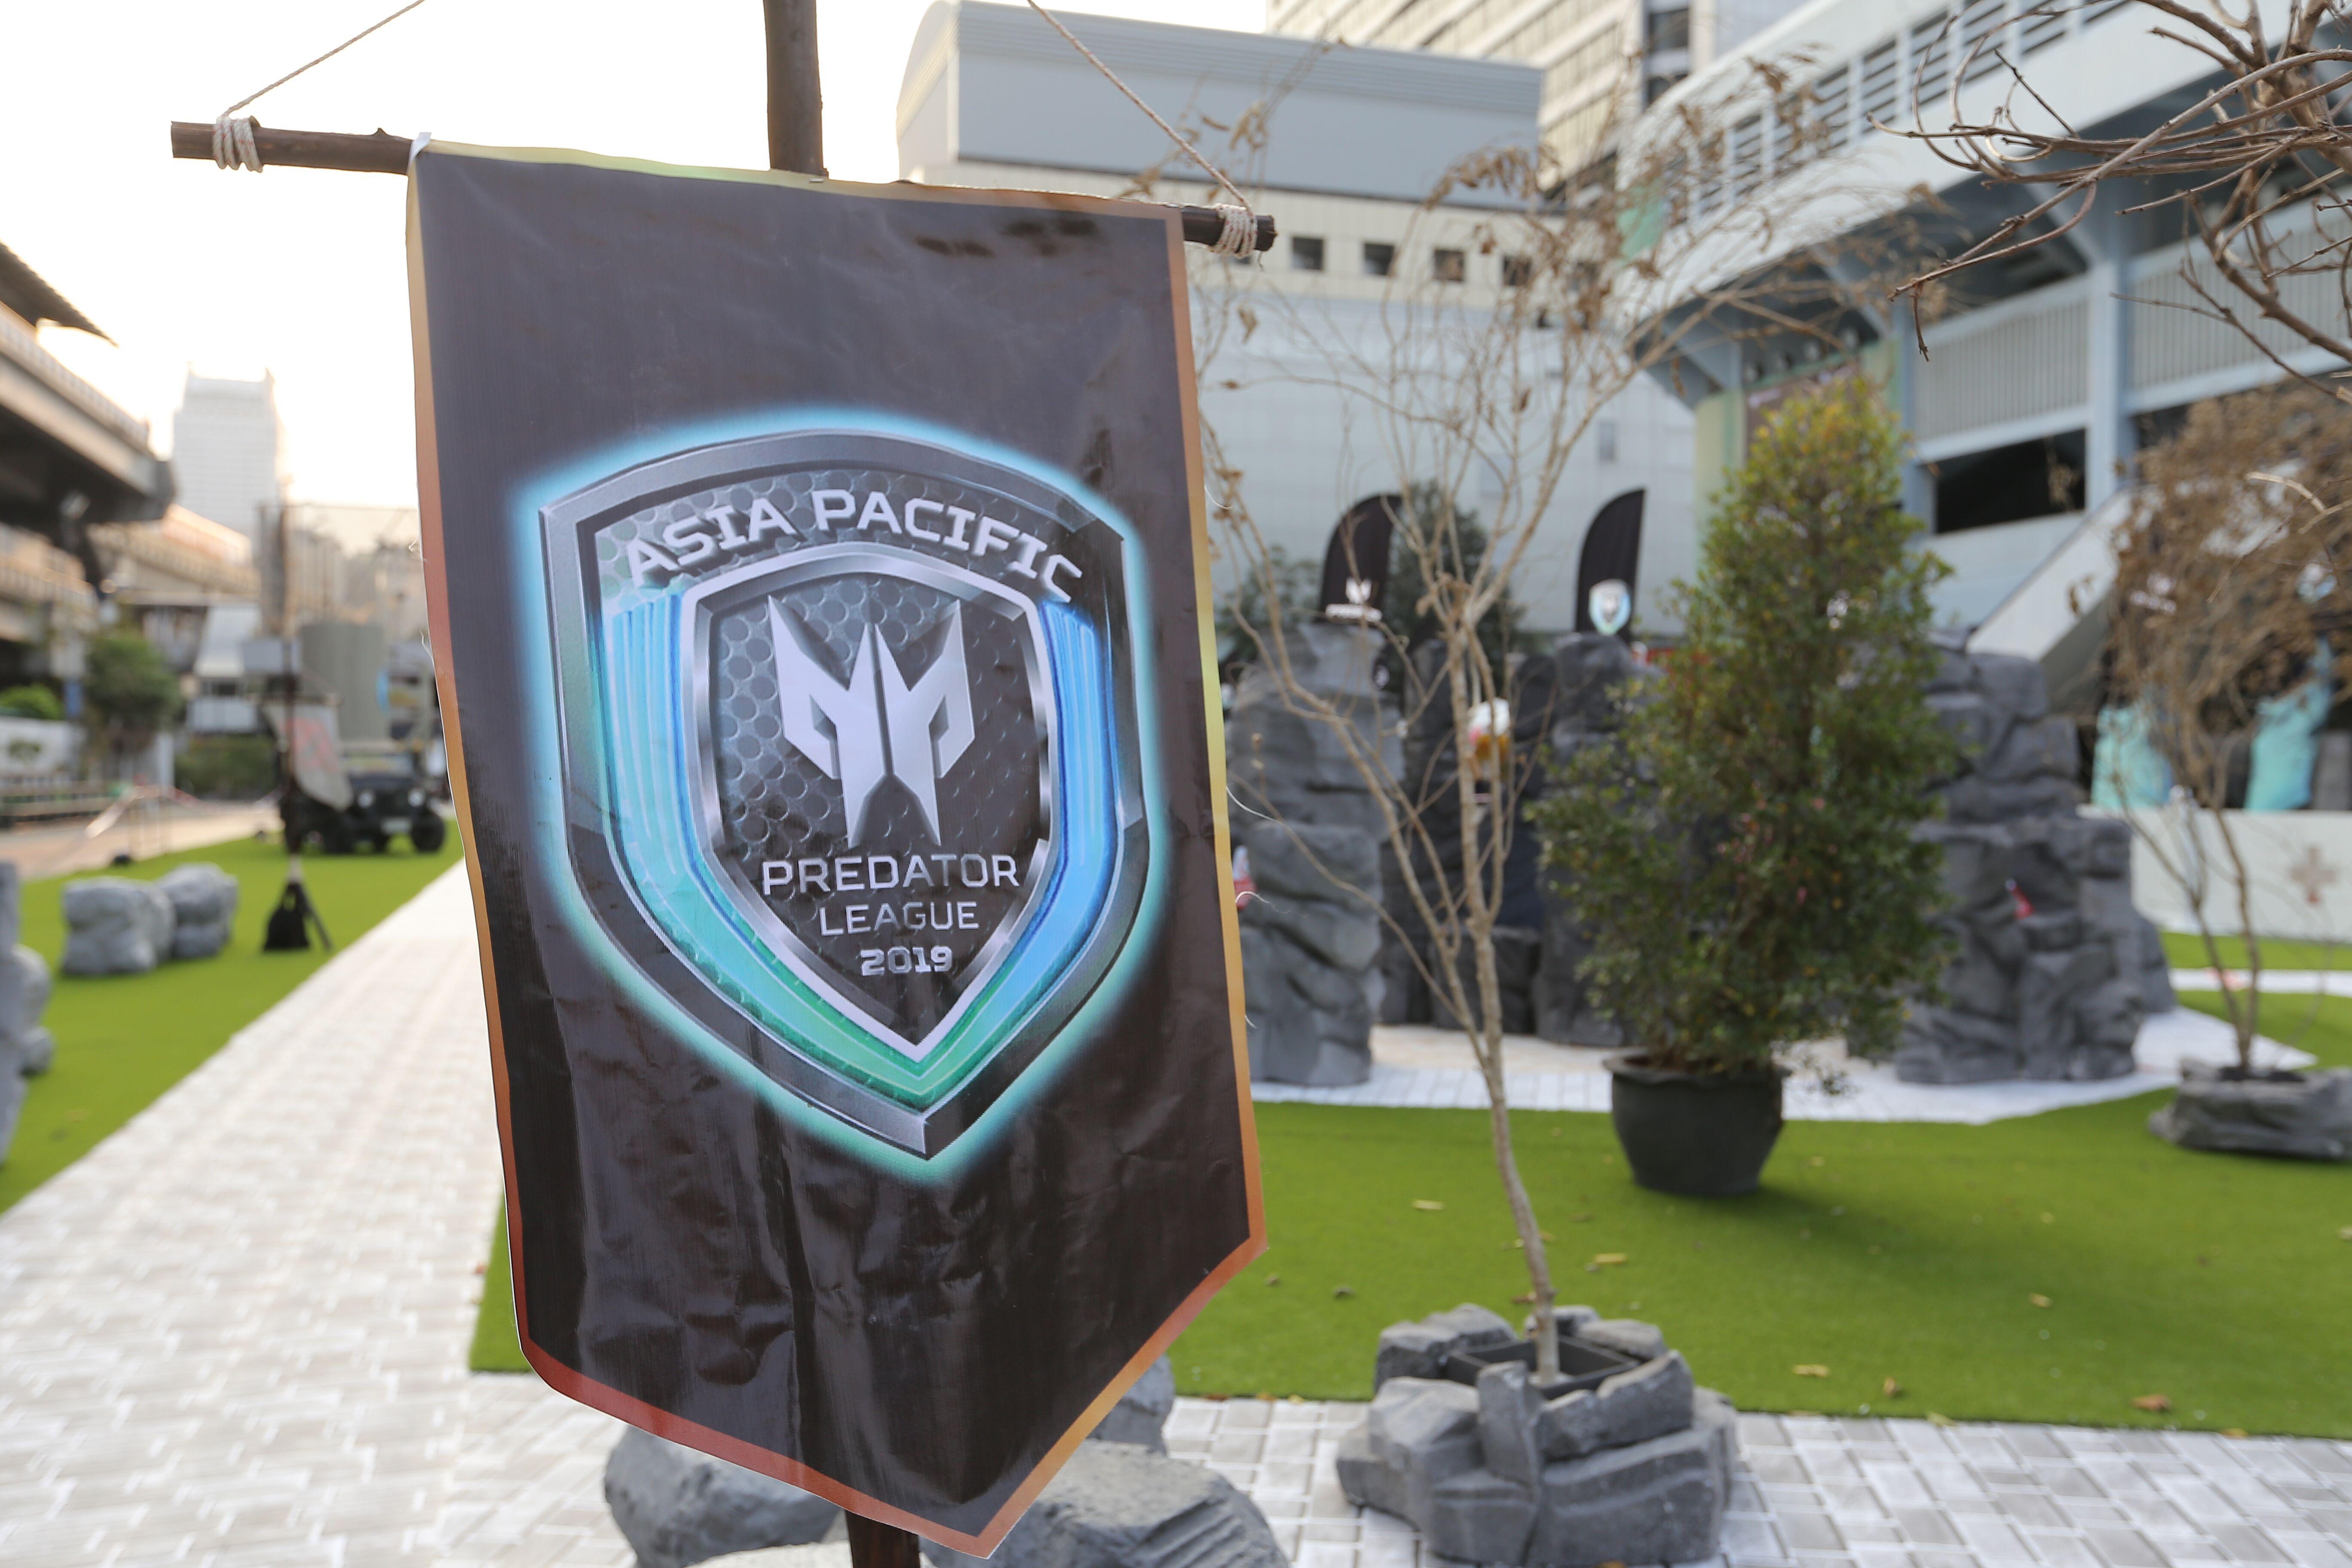 yaiilnw0 jpeg บรรยากาศงาน Asia Pacific Predator League 2019 สุดยอดขุนพลทีมอีสปอร์ตเข้าร่วมการแข่งขันรอบแกรนด์ไฟนอล